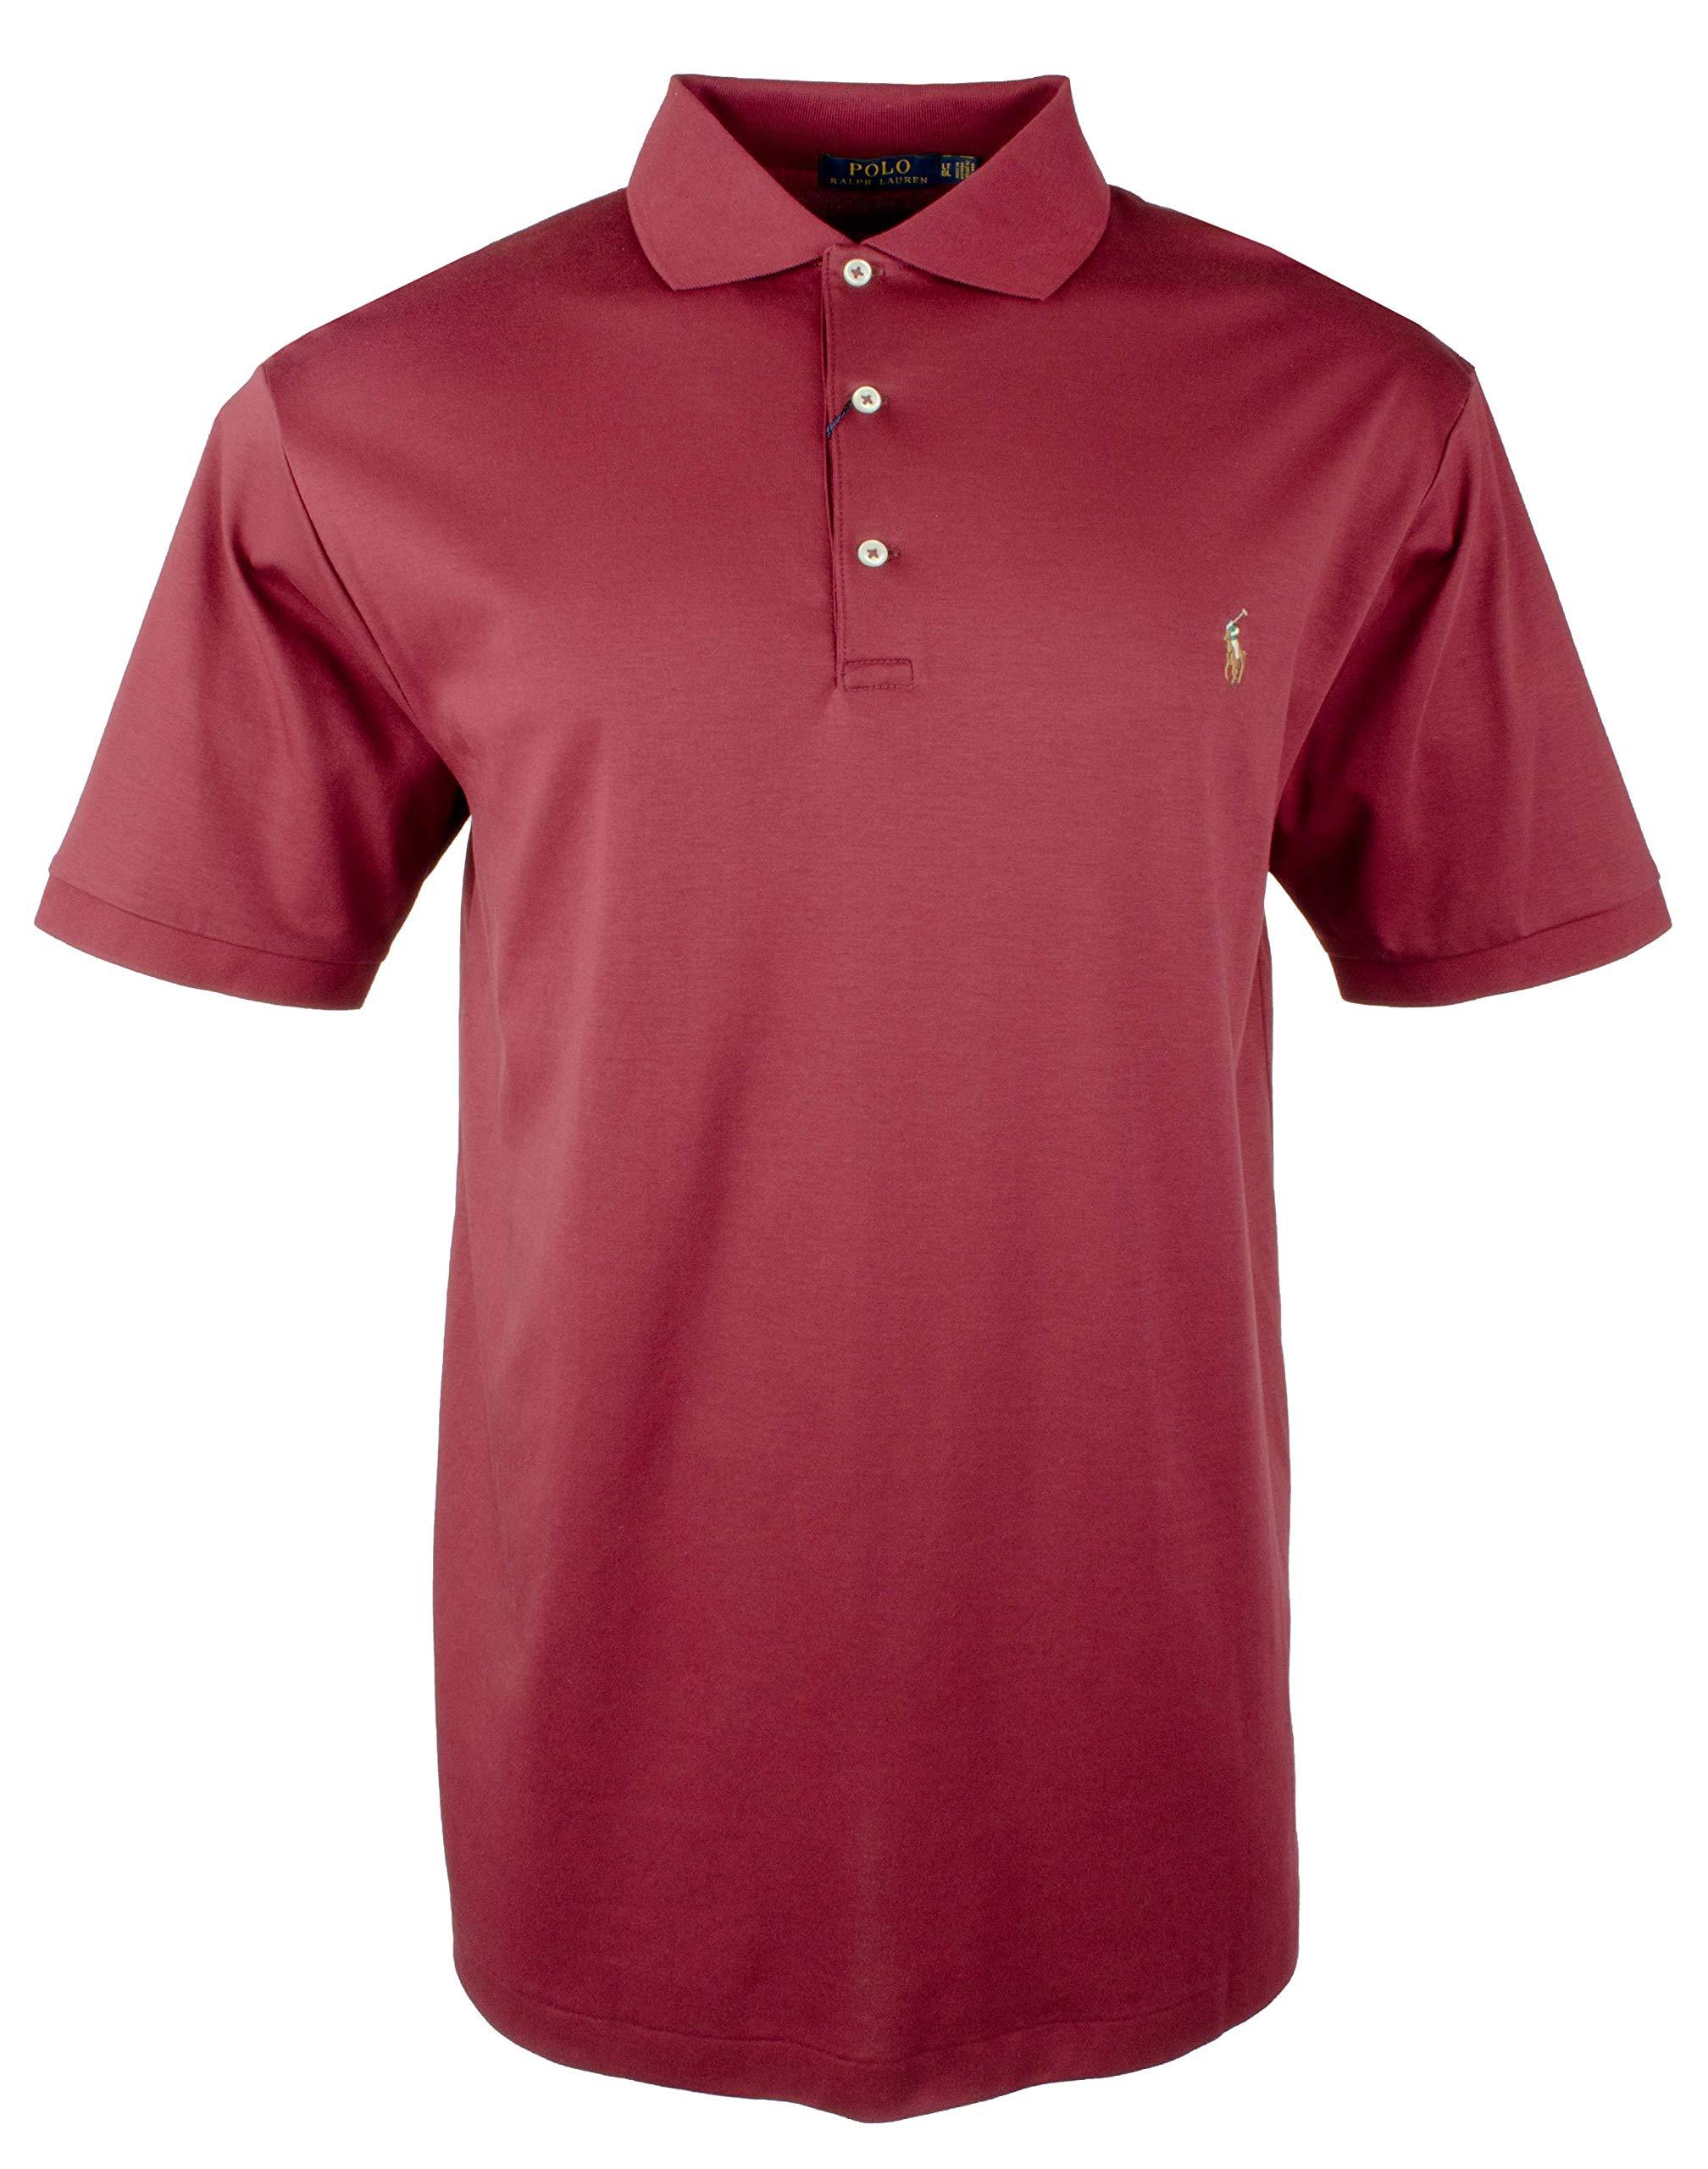 Polo Ralph Lauren Men's Big & Tall Classic Fit Cotton Soft Polo Shirt-R-3LT by Polo Ralph Lauren (Image #1)